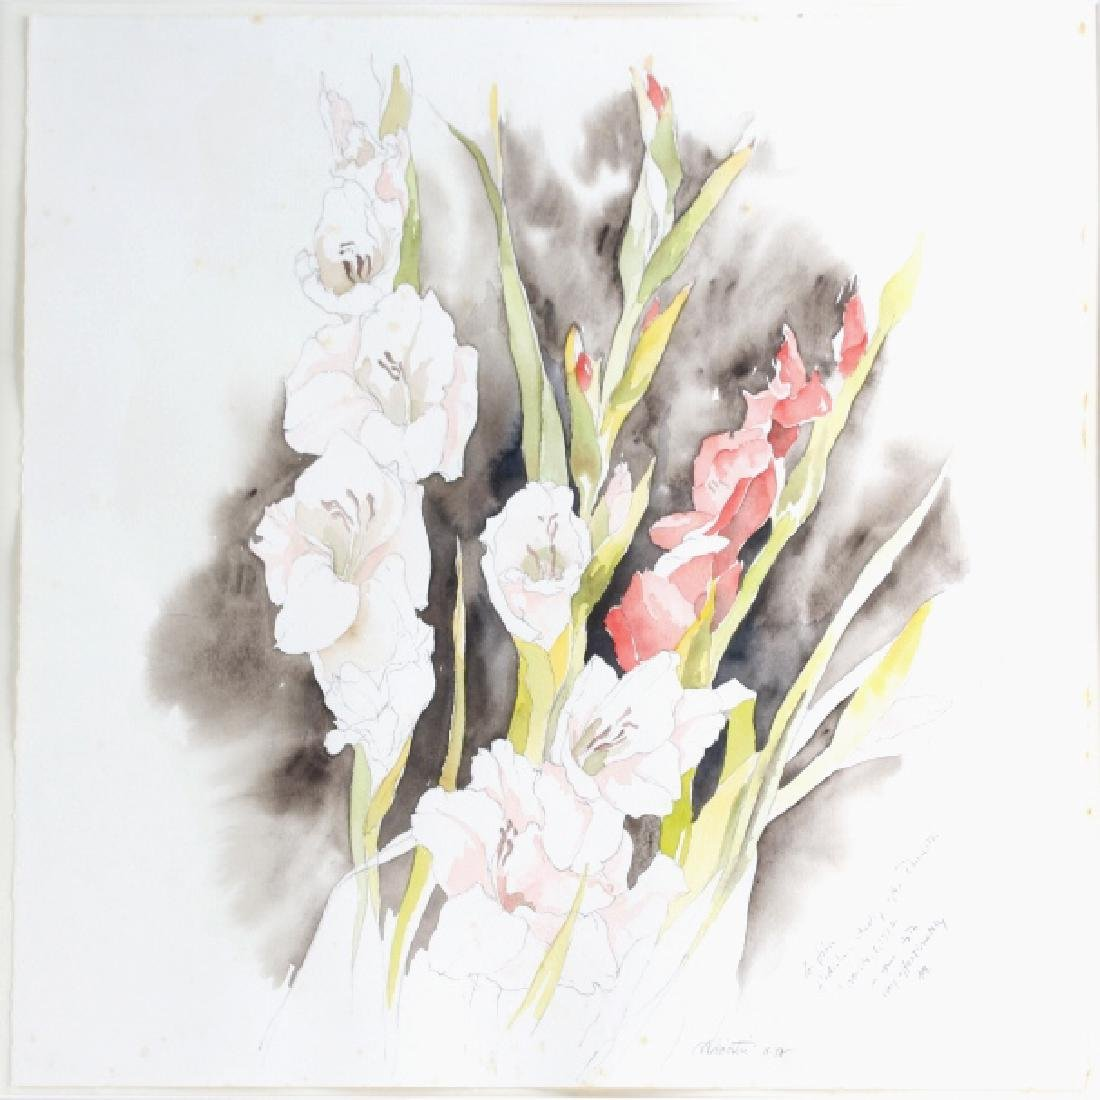 Joe Nicastri Floral Still Life Watercolor Painting